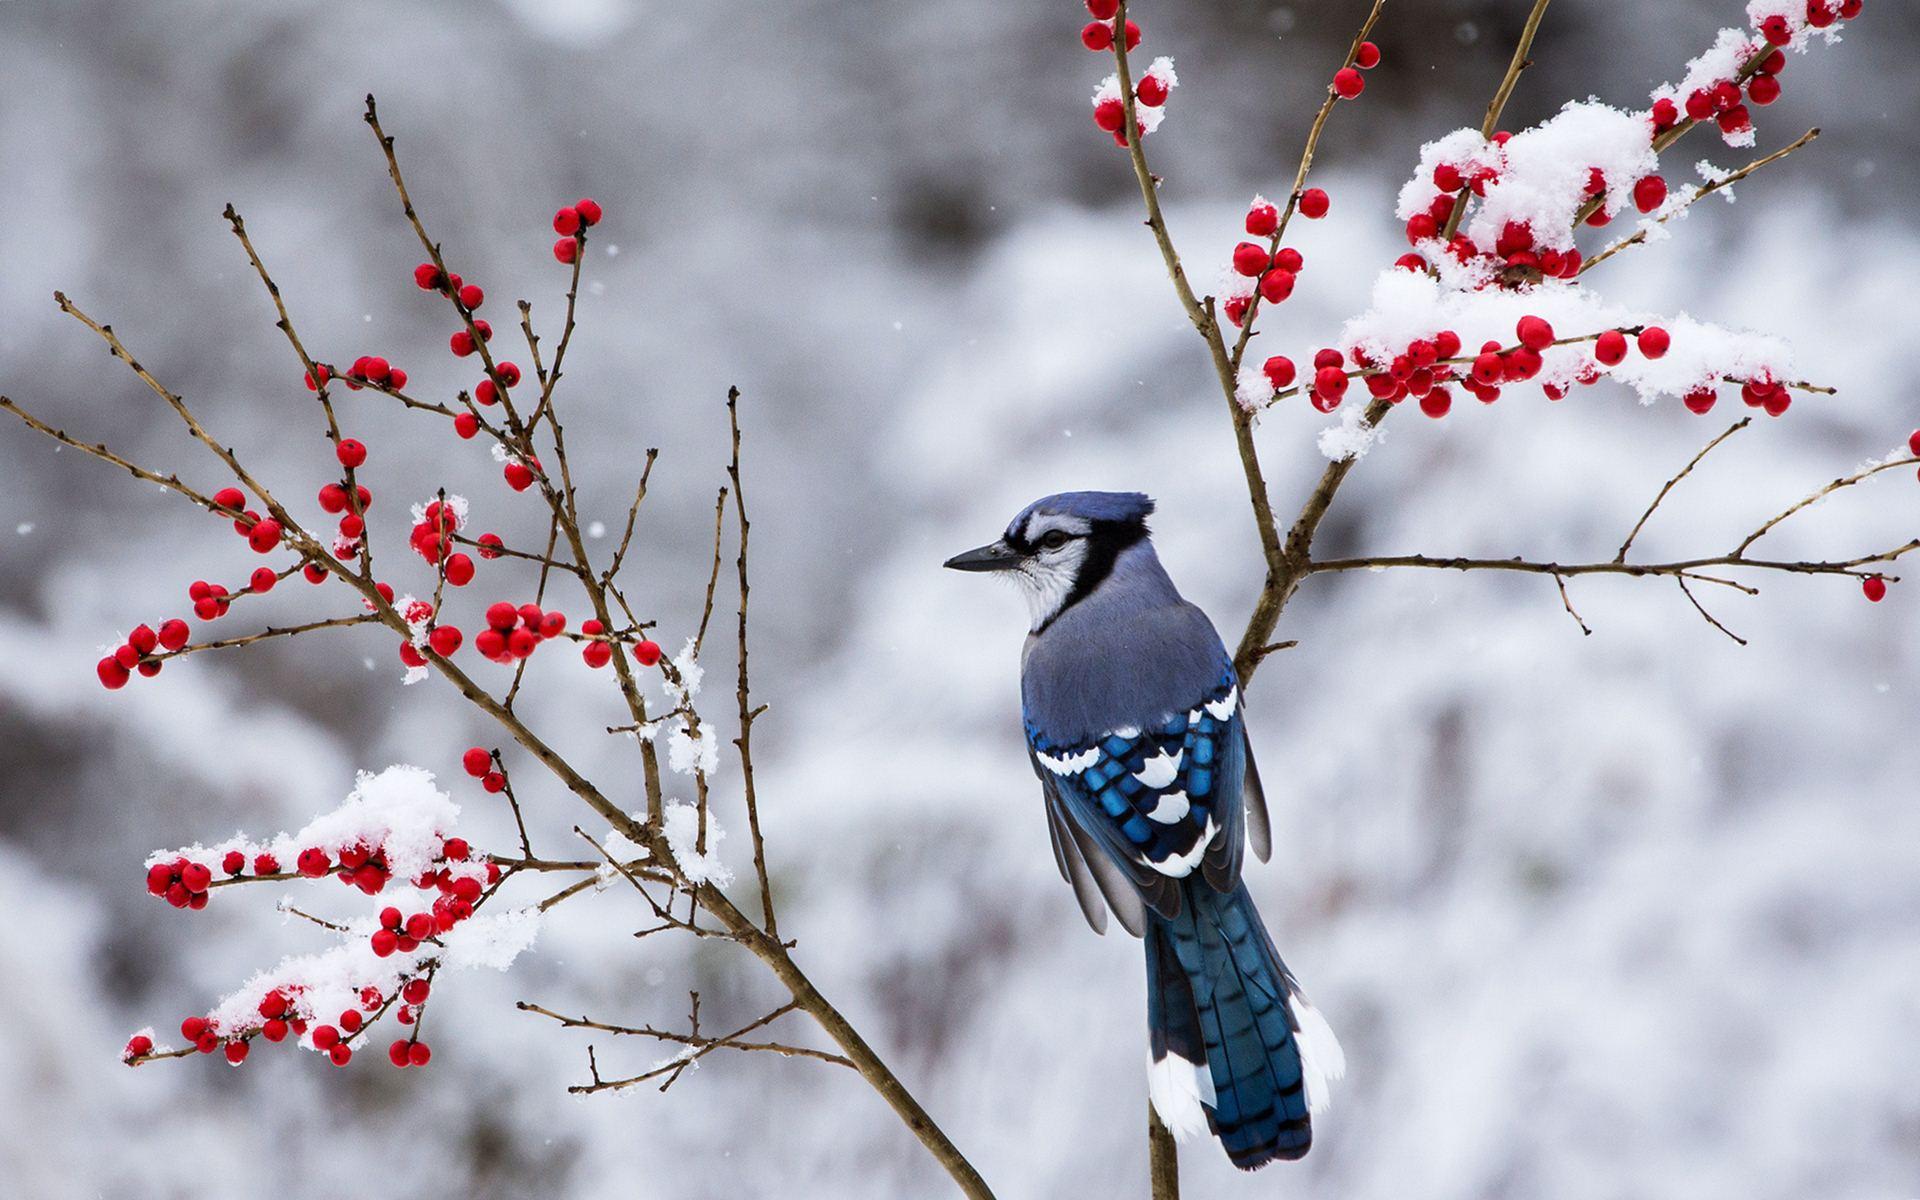 Dwnld Cute Little Bird Walpaper Free Fr Mobile: 15 Fantastic HD Bird Wallpapers